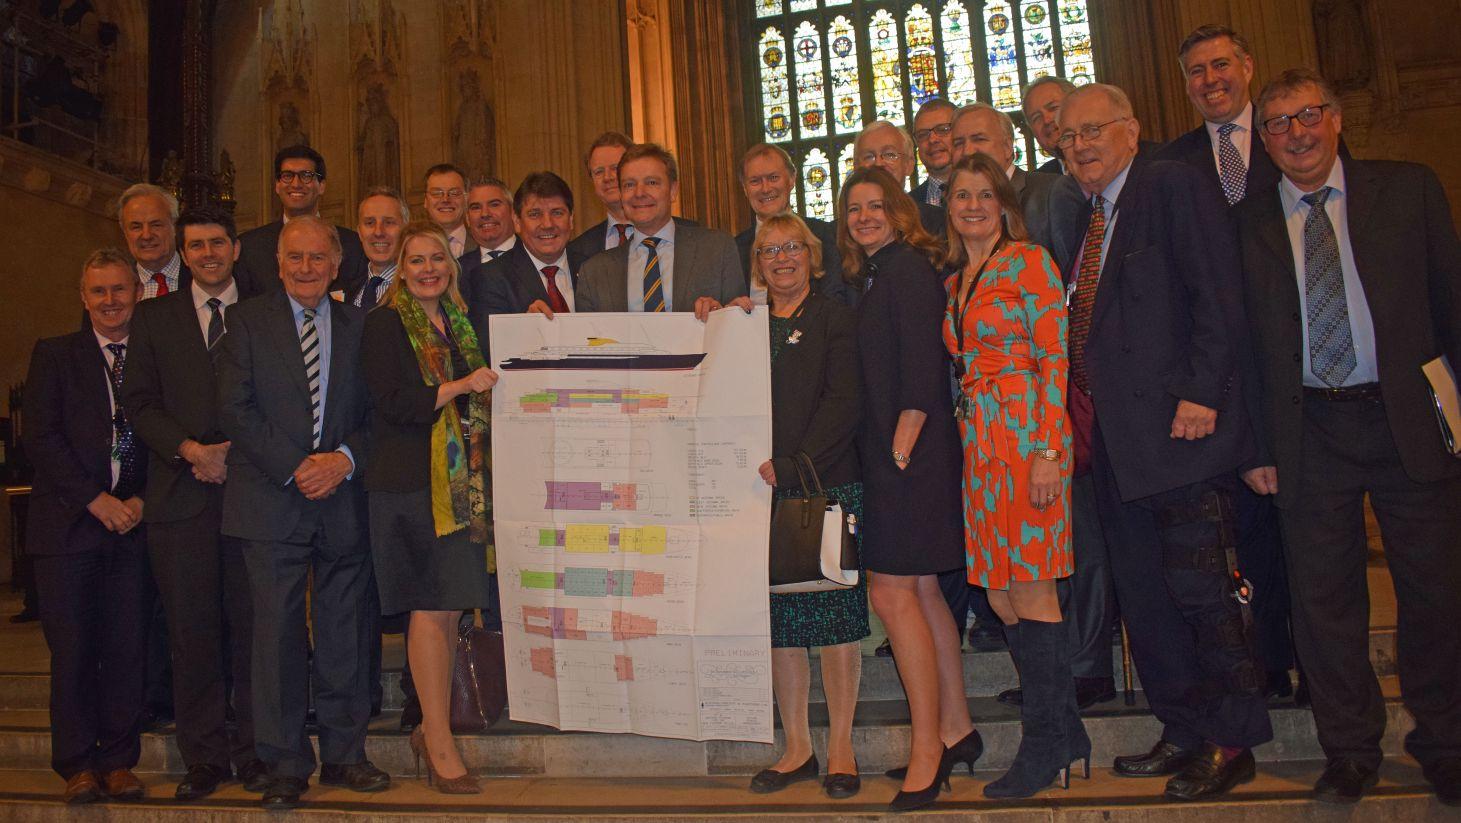 Bring Back Britannia MPs' photo call1 Westminster Hall 20 Dec17.jpg